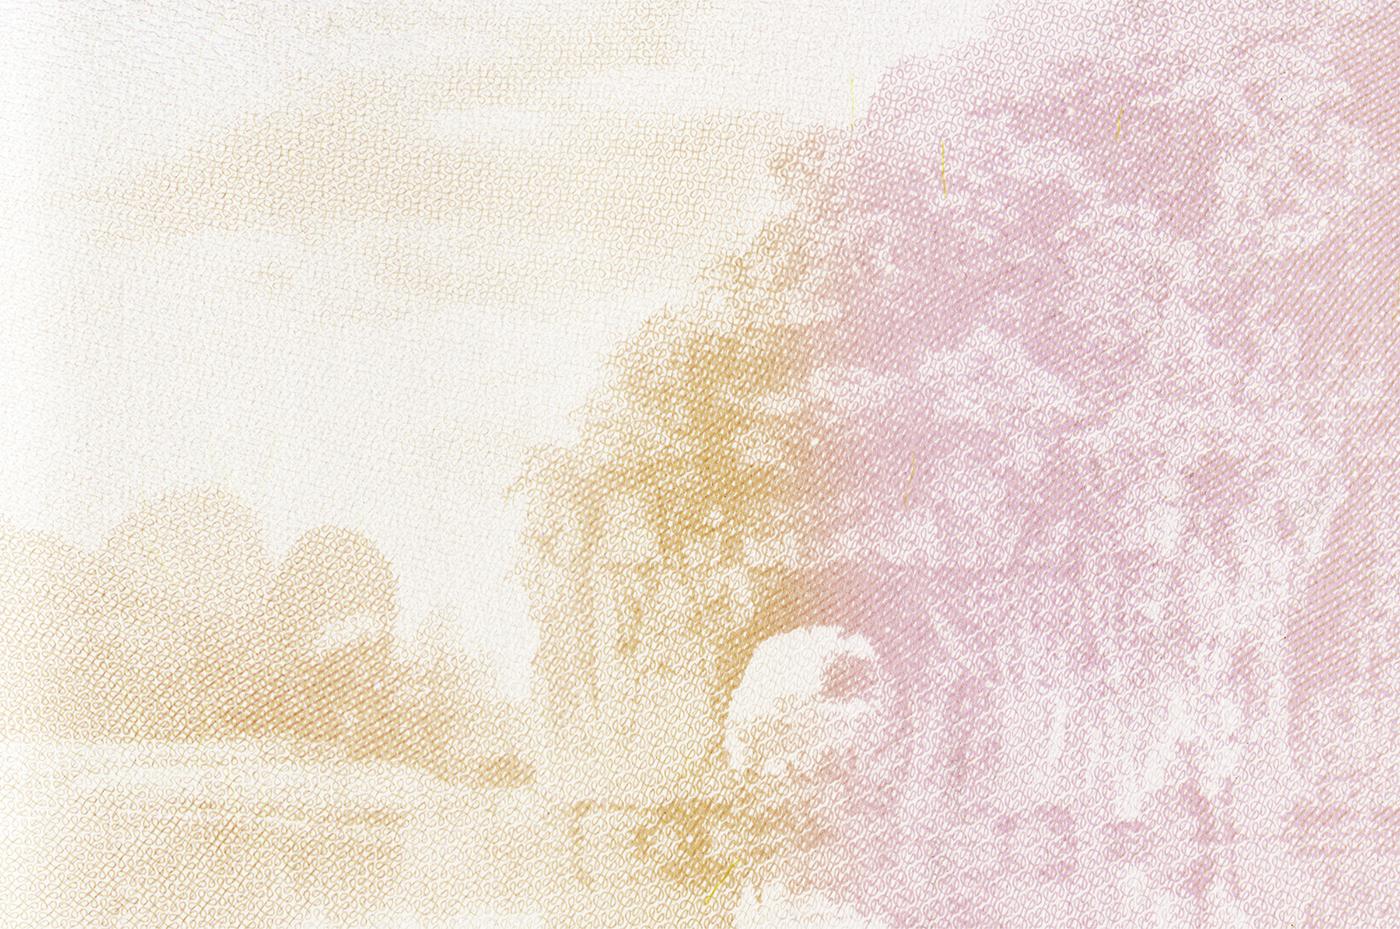 Jesse Chun, Landscape #8 , Archival Inkjet Print, 20 x 30 inches